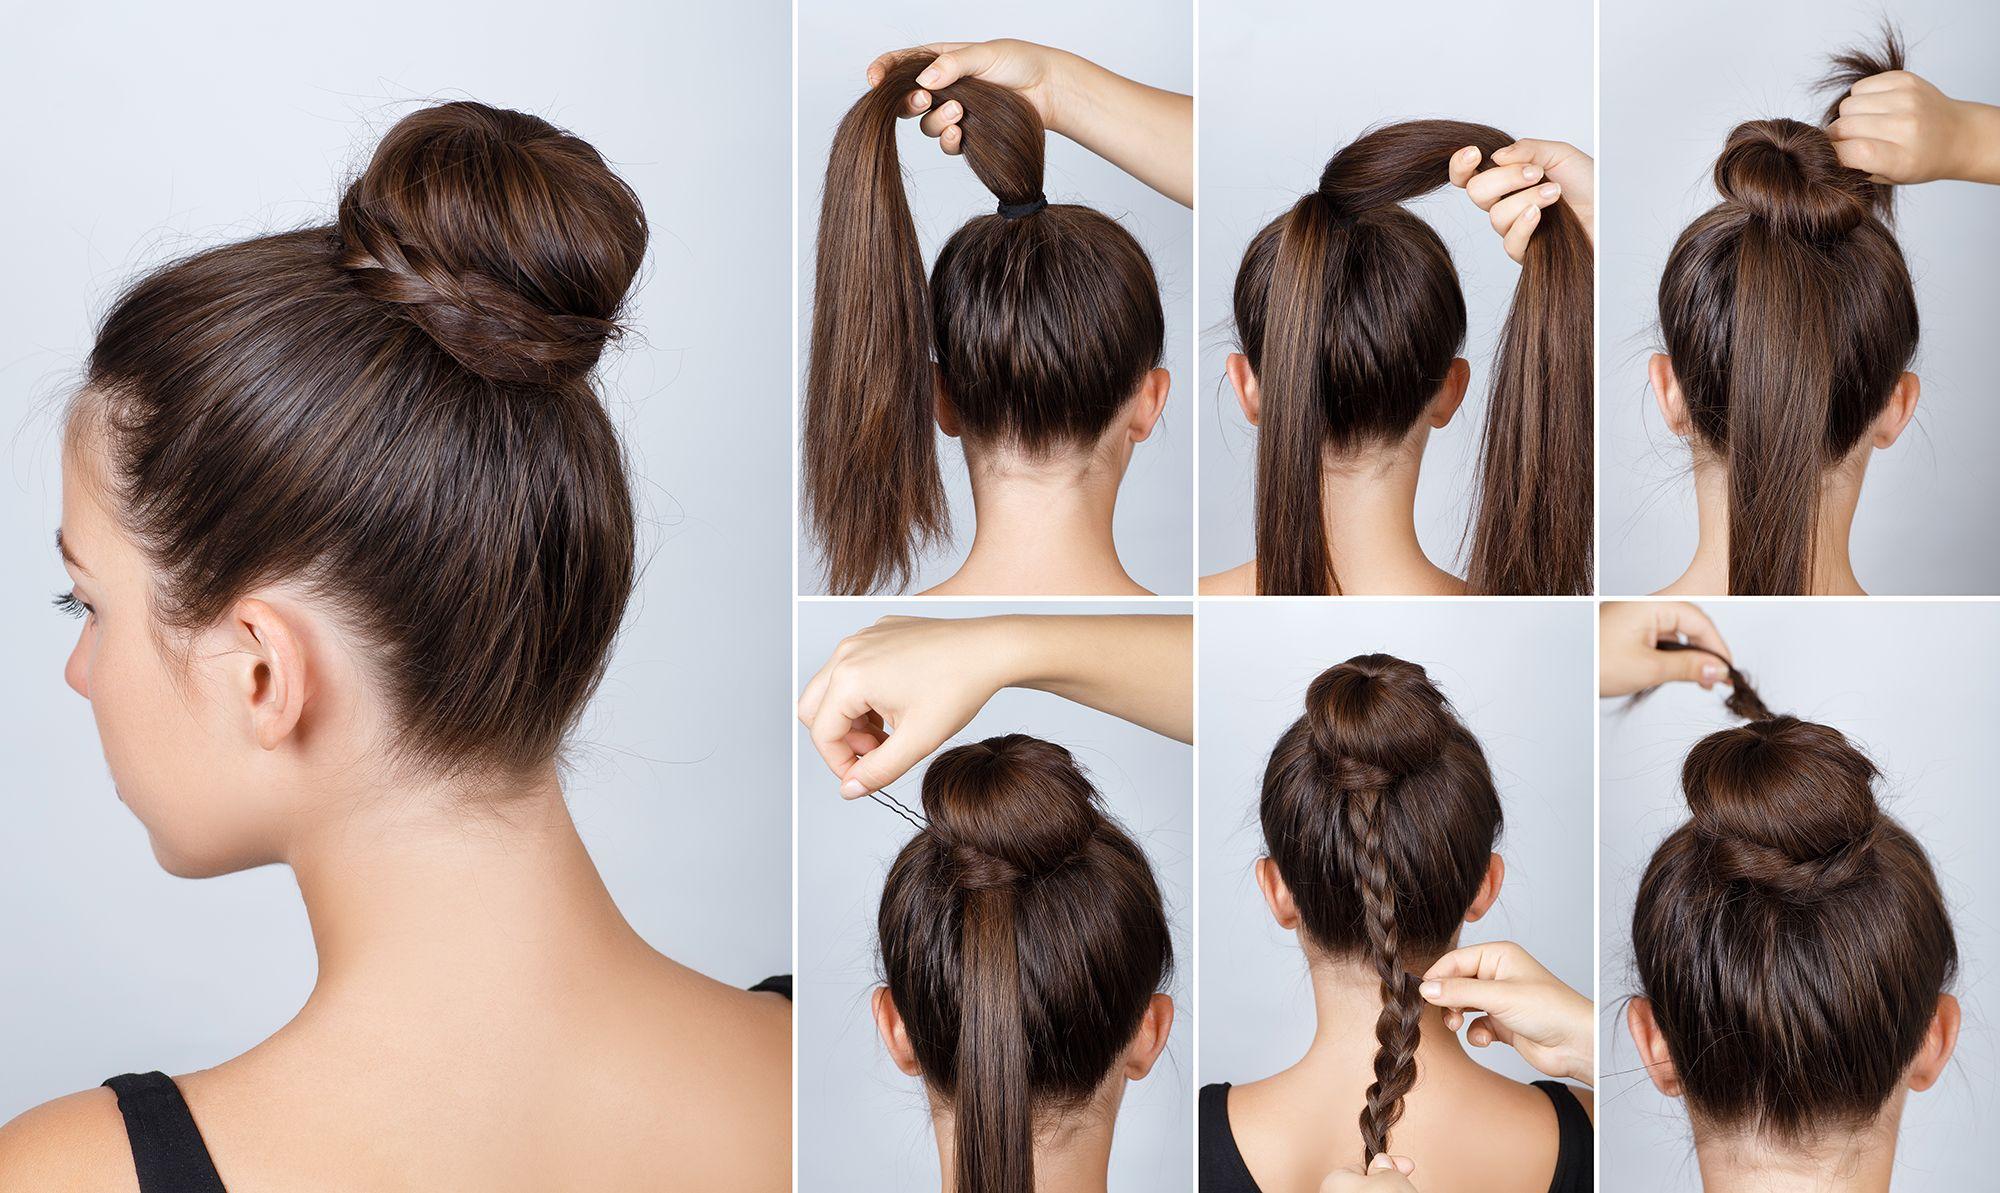 Acconciature capelli lunghi e medi